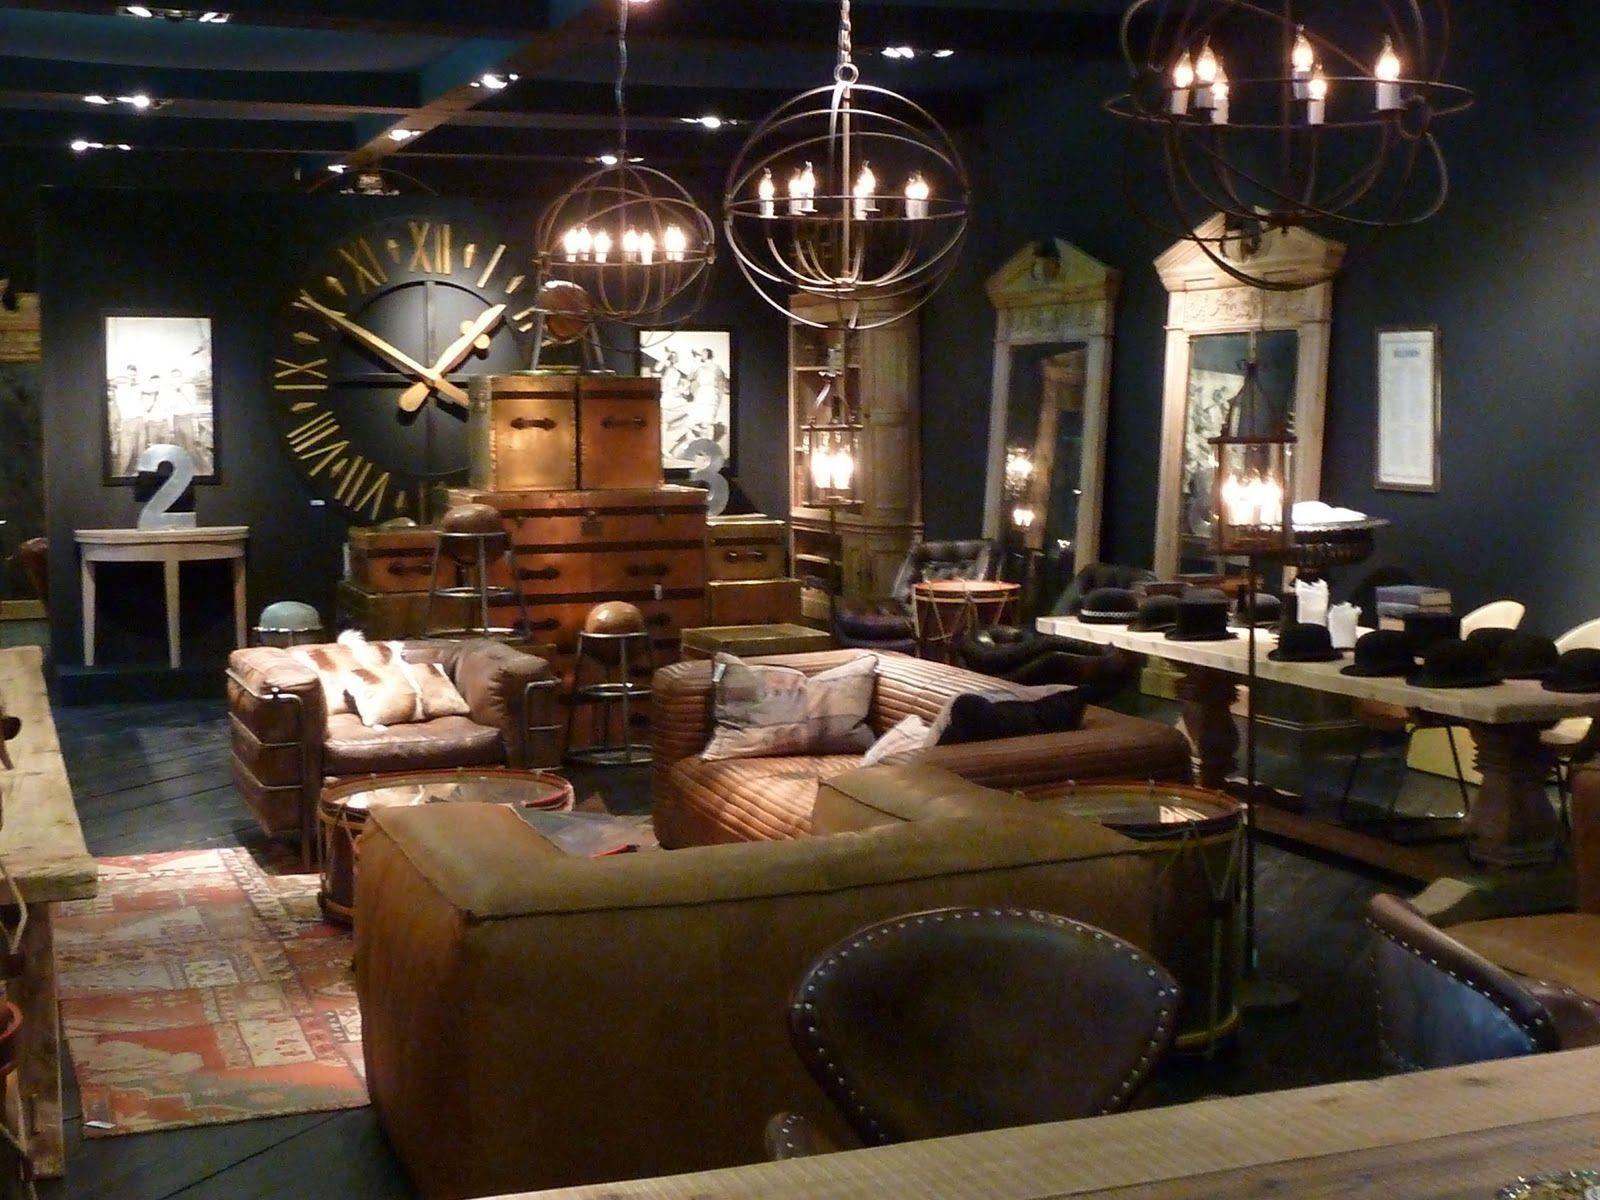 Steampunk Bedroom Decor Ideas, Diy, Curtains, World Maps, Inpiration, Art